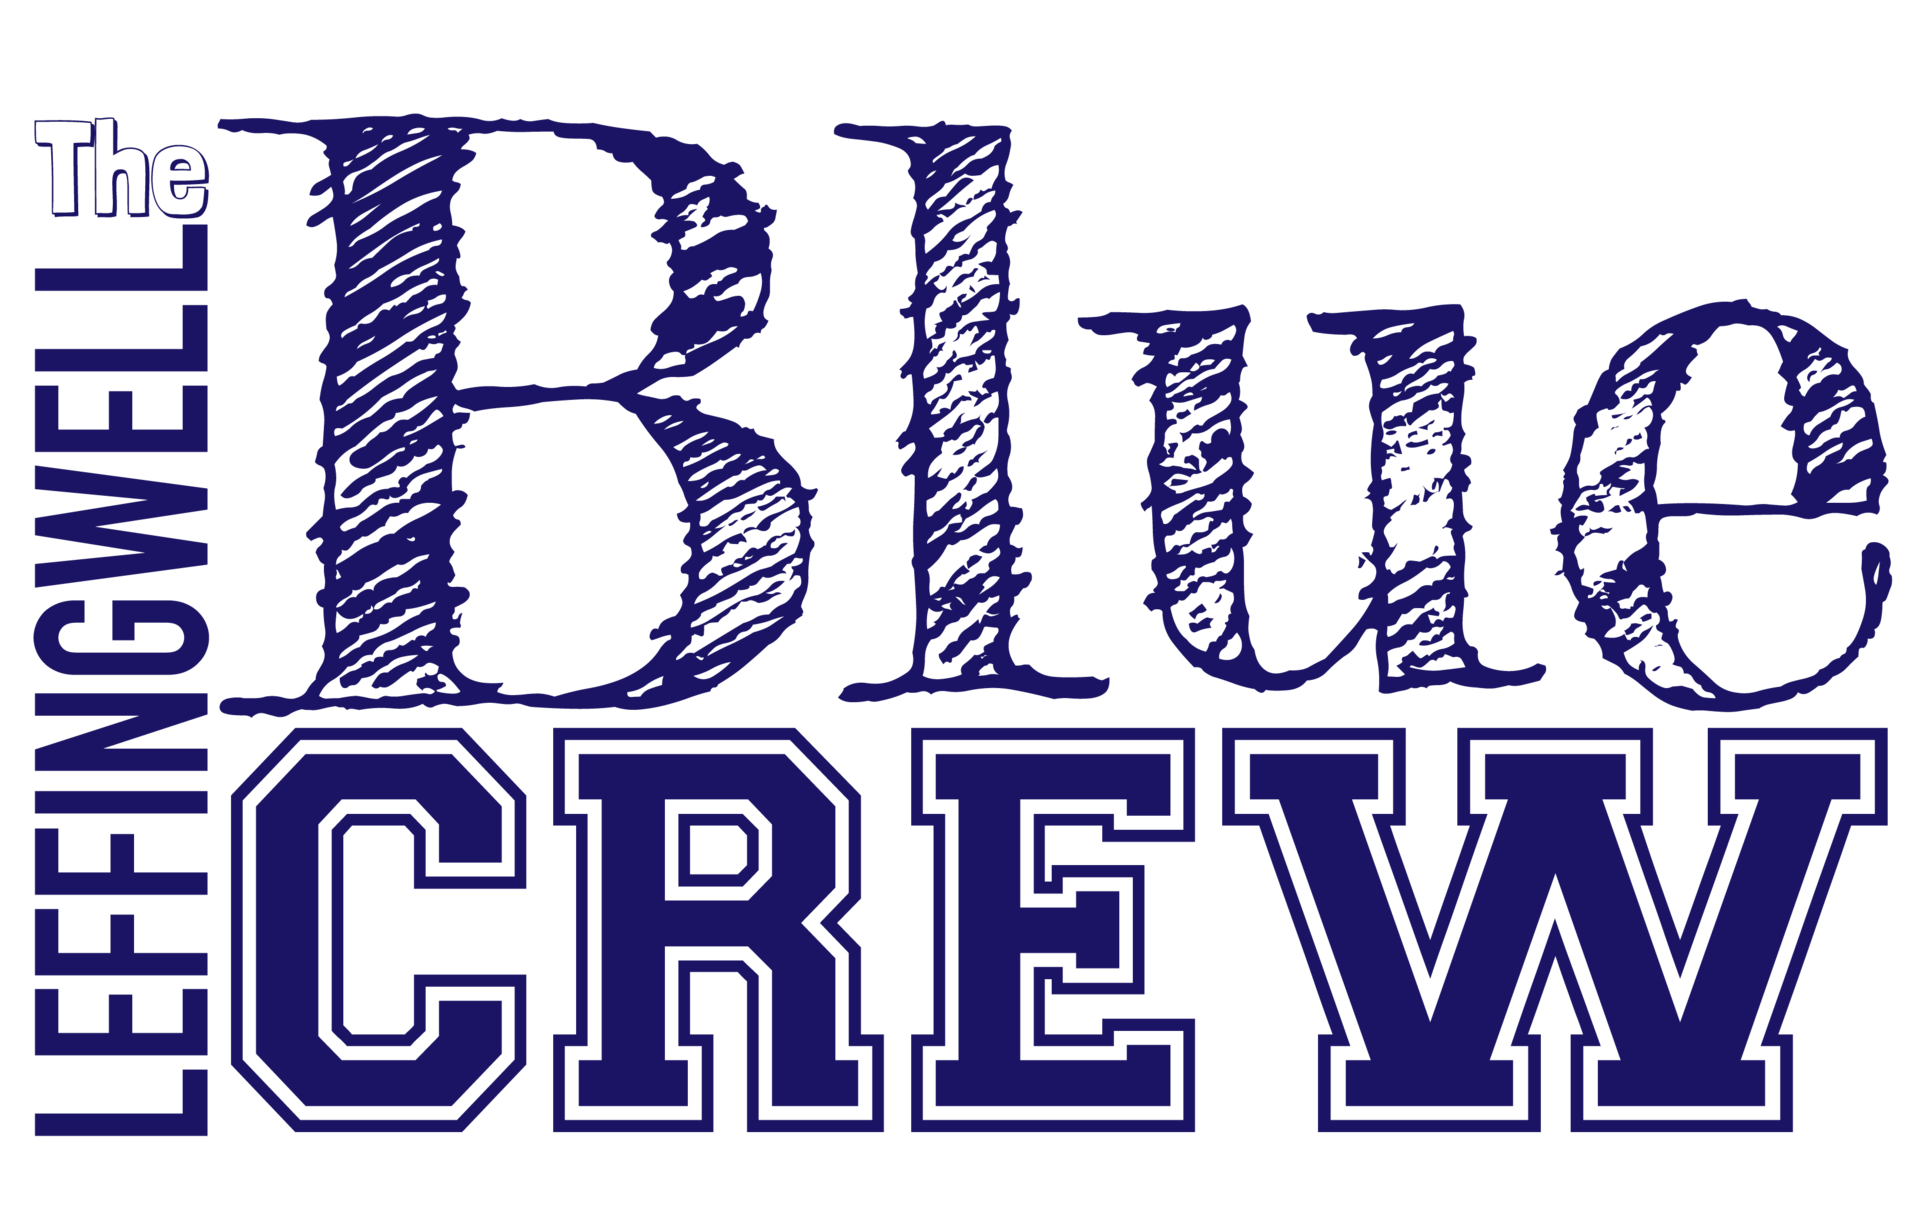 19-20 Logo